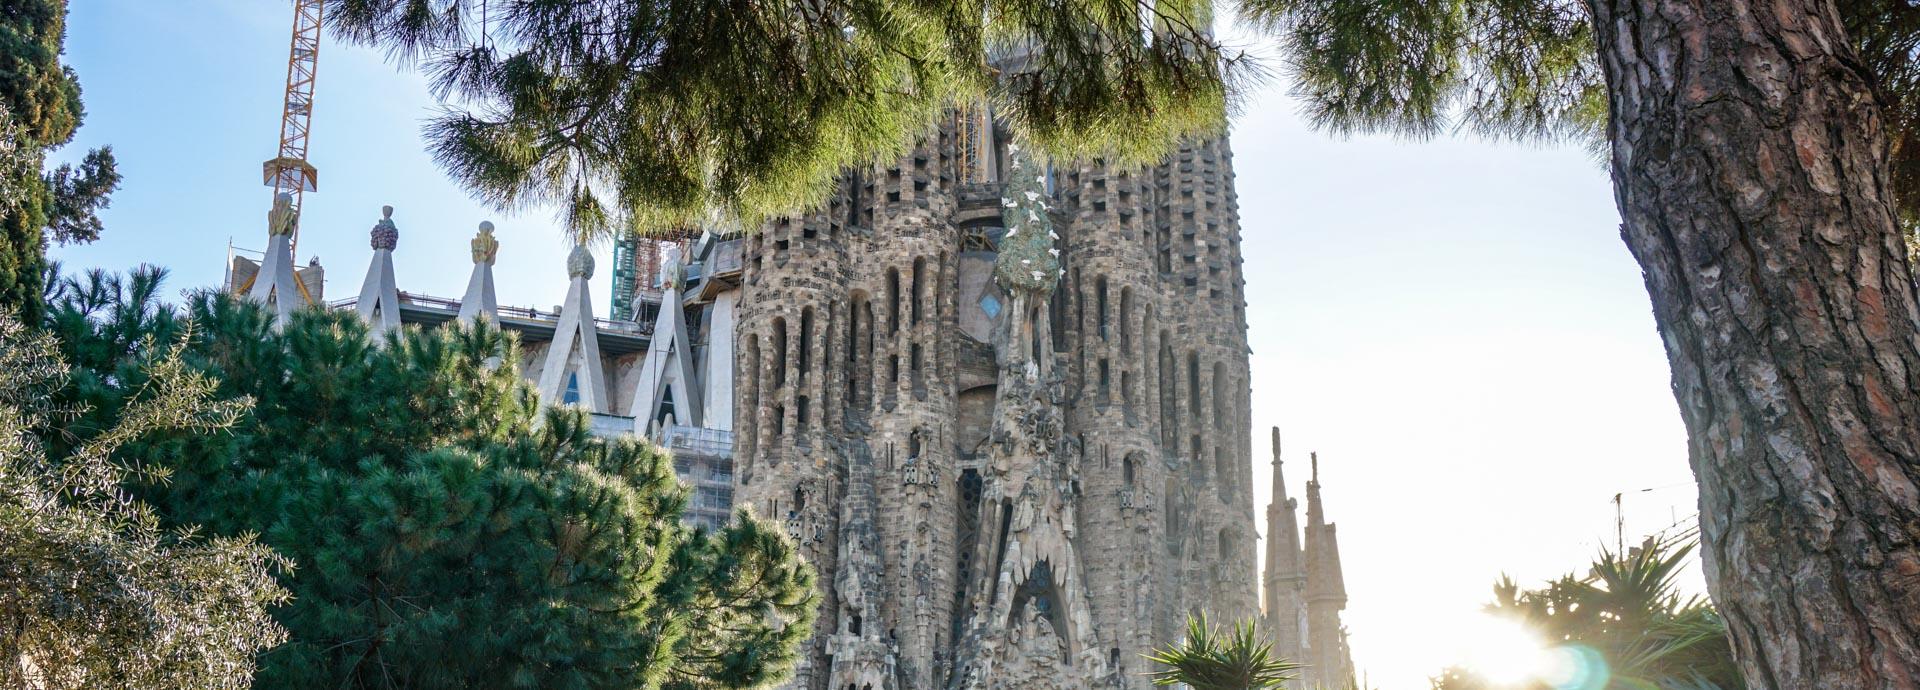 Путешествие в Барселону Испания